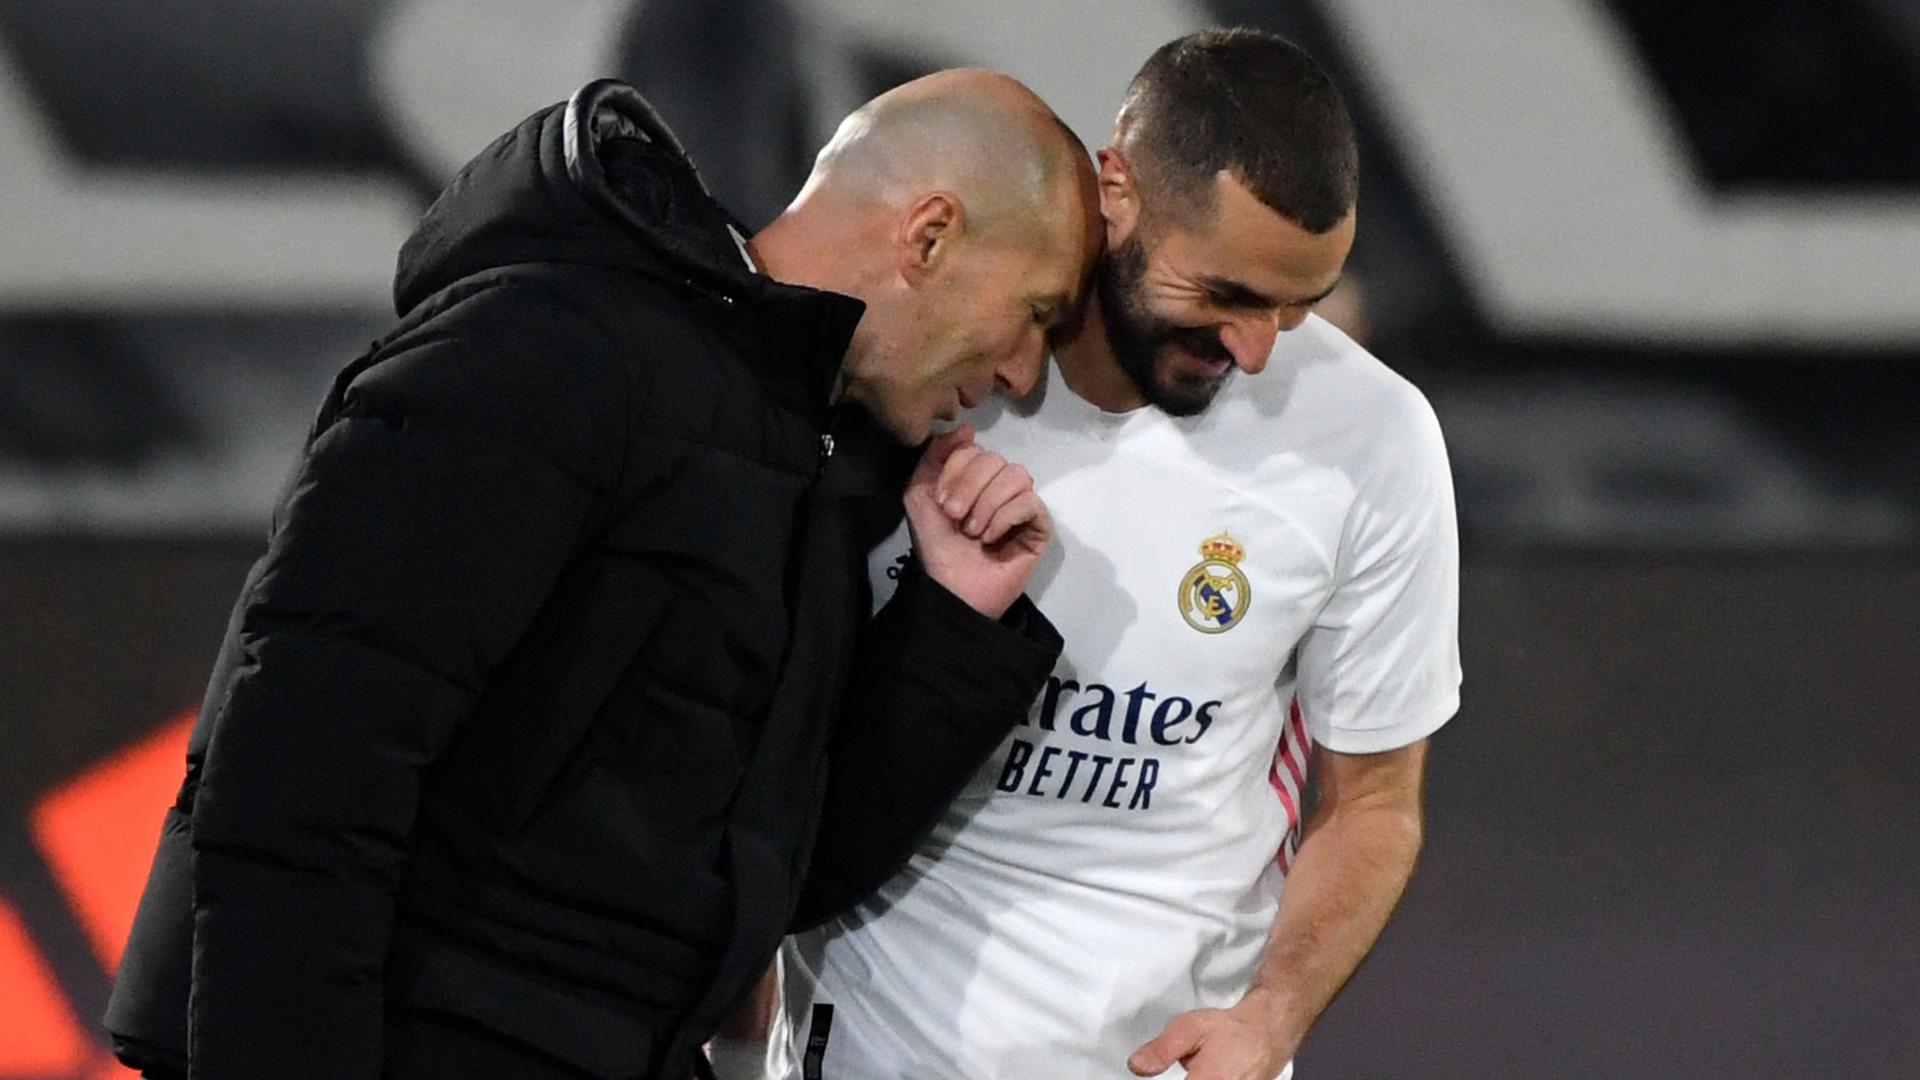 Real Madrid eye Italian job, Man City put winning run on the line – Champions League in Opta numbers